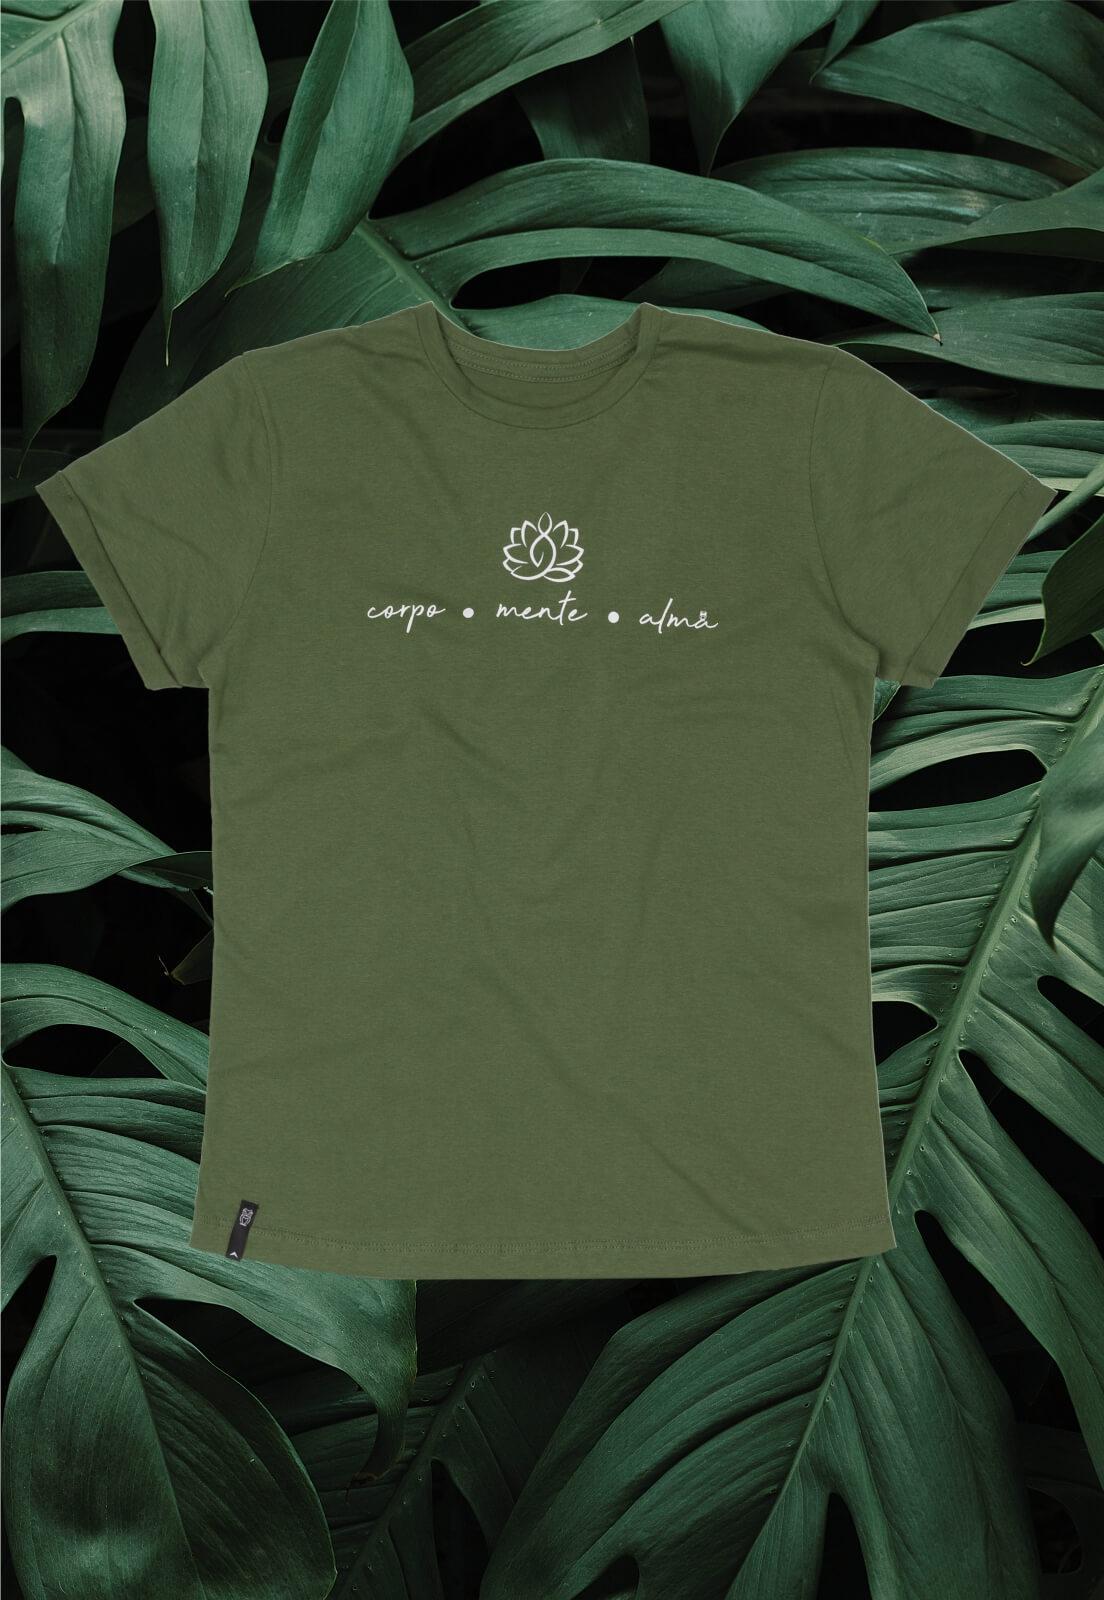 T-shirt Nogah Corpo • Mente • Alma